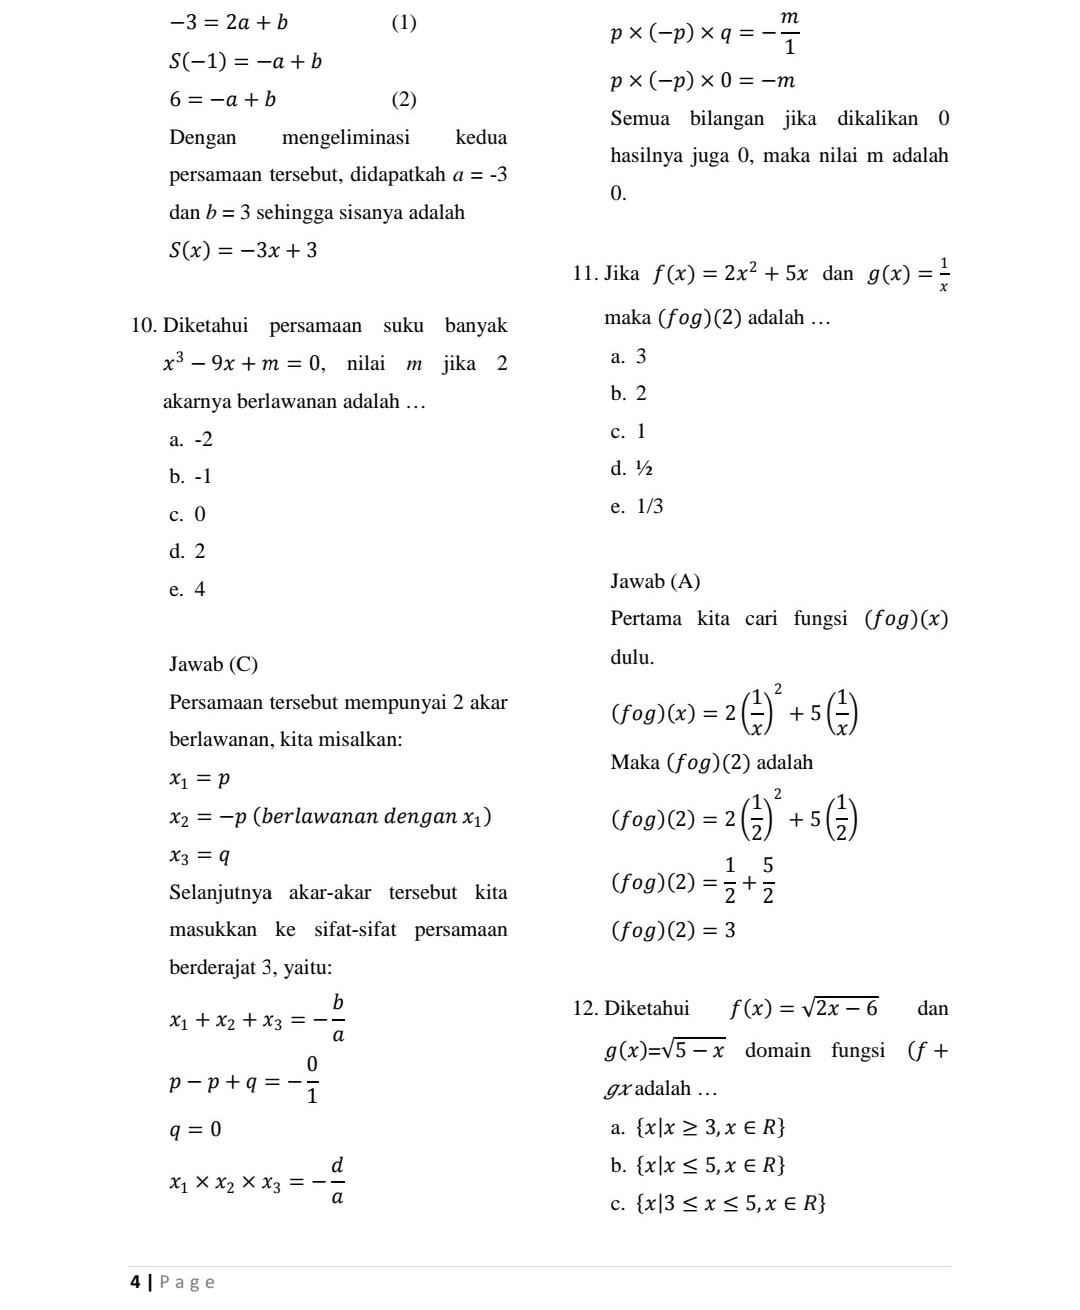 Kunci Jawaban Matematika Kelas 11 Semester 2 Kurikulum 2013 Ilmusosial Id